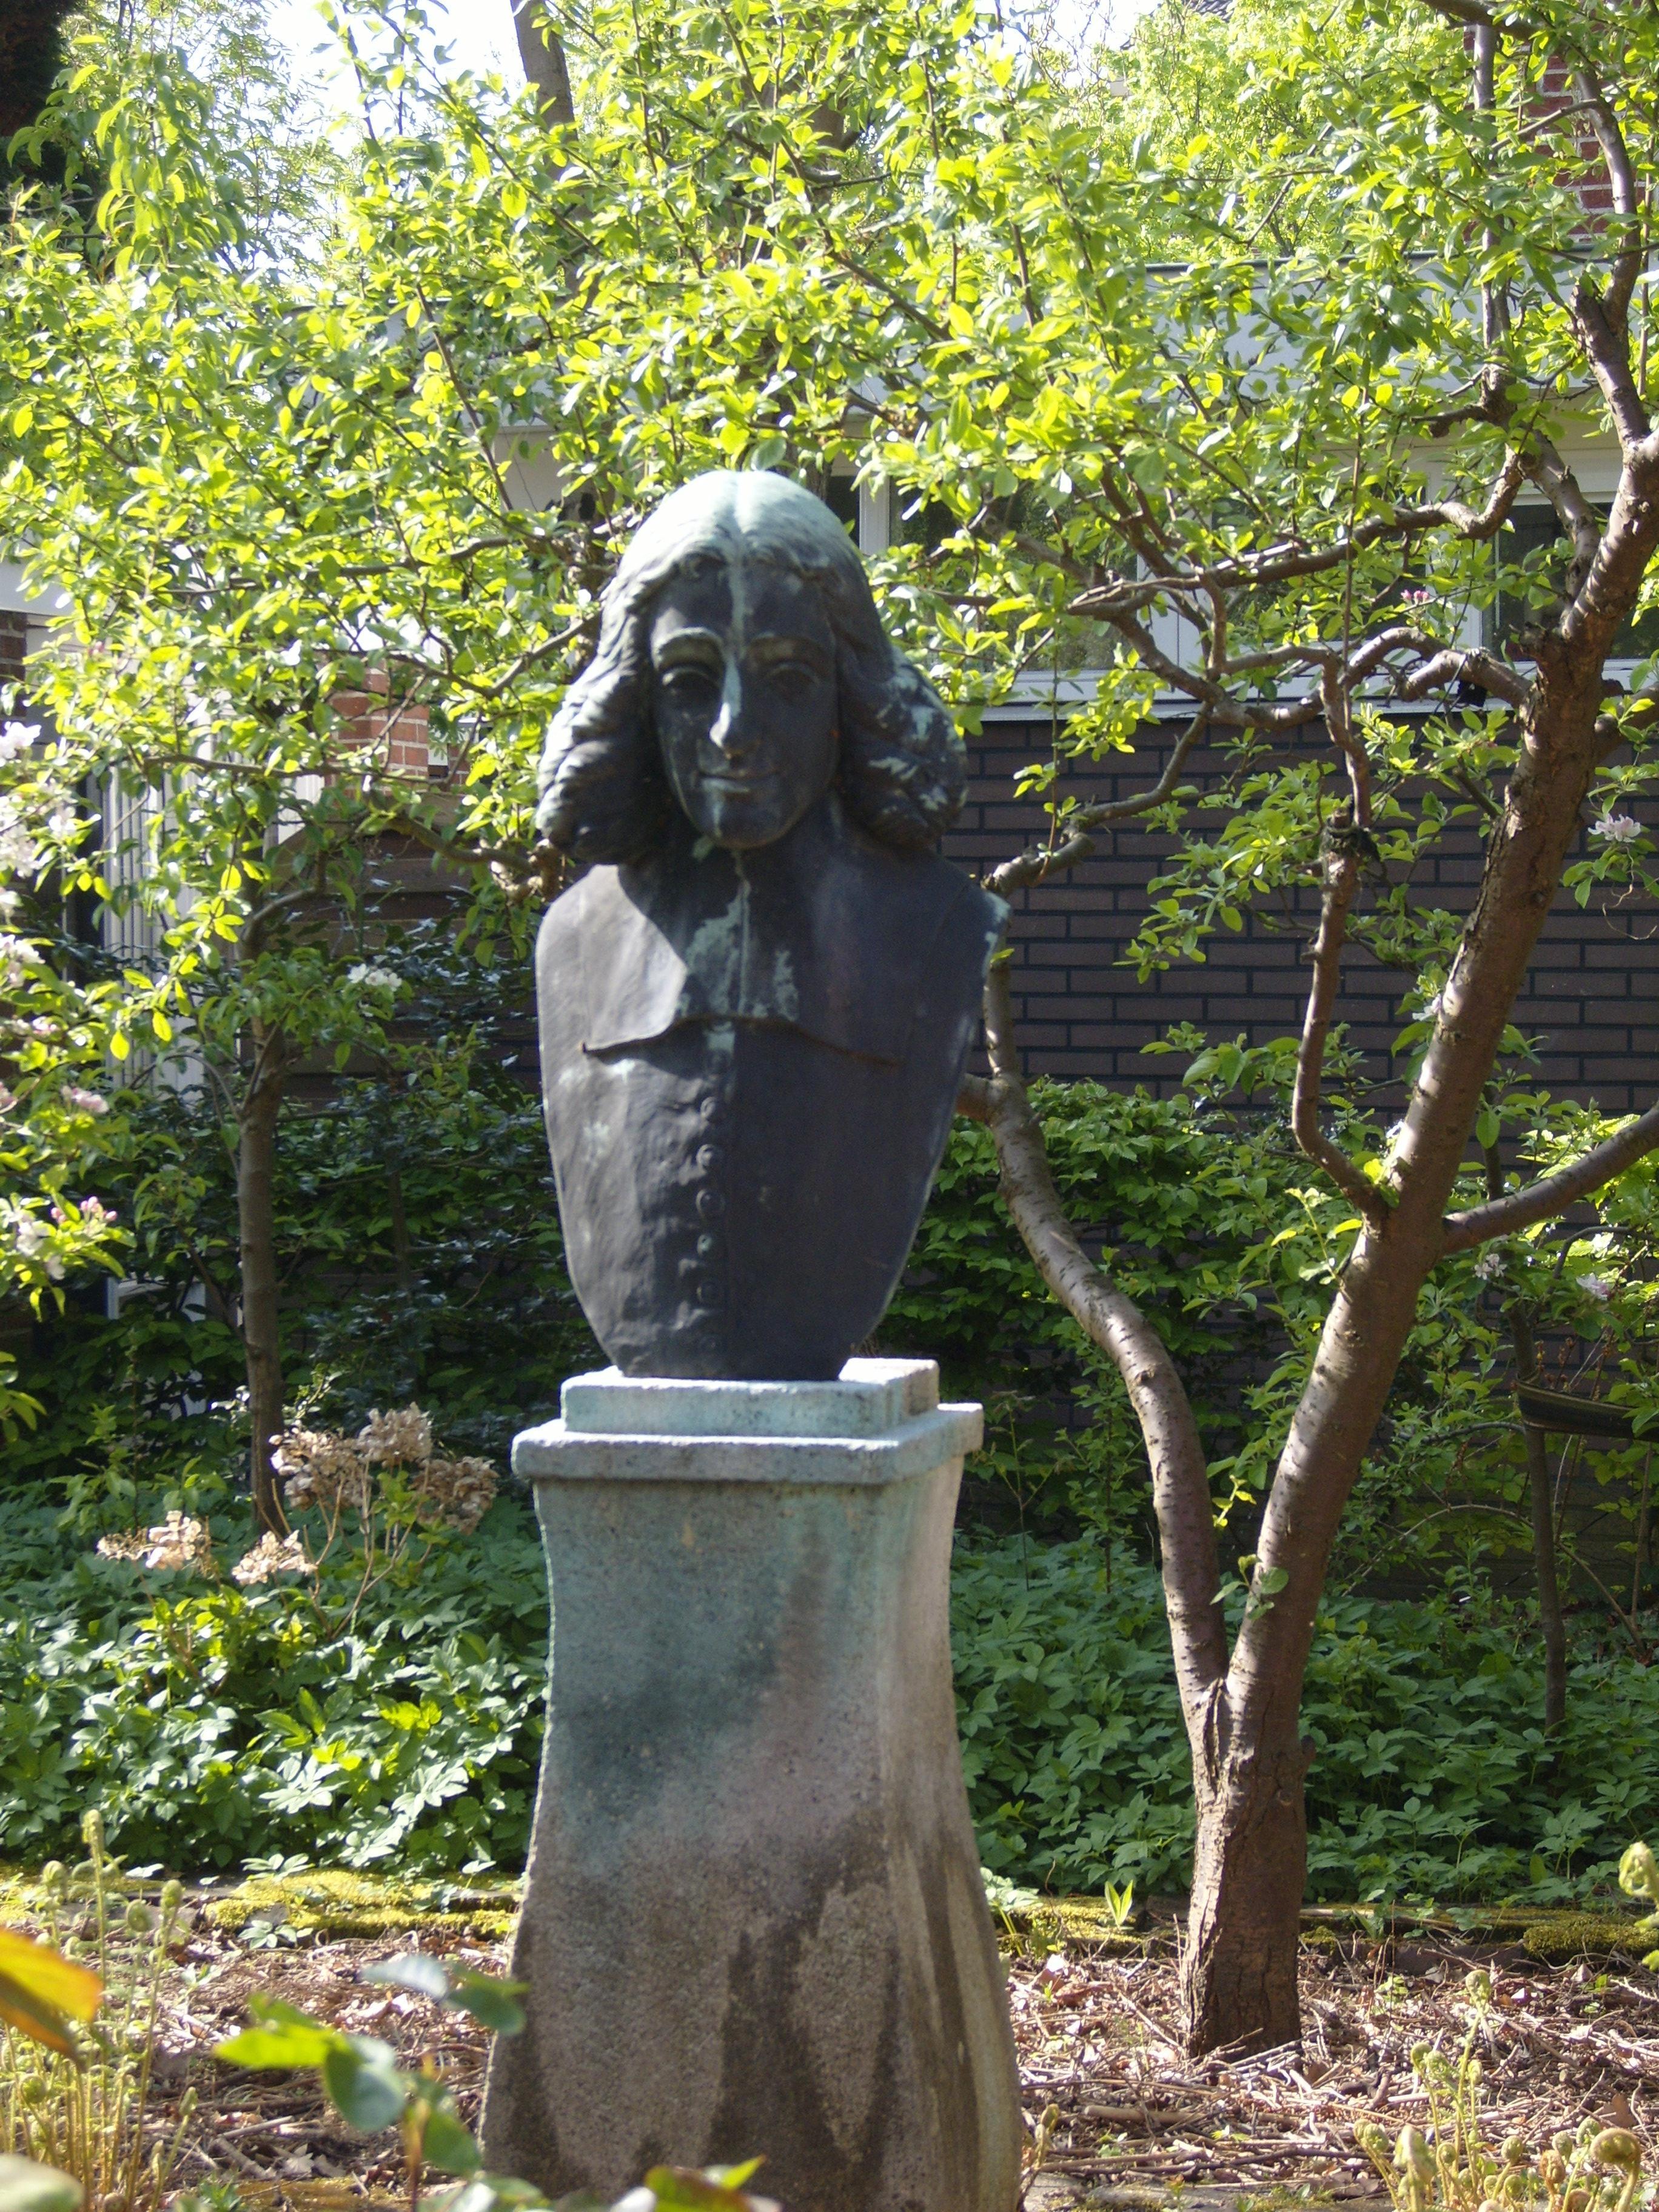 le buste de Spinoza à Rijnsburg